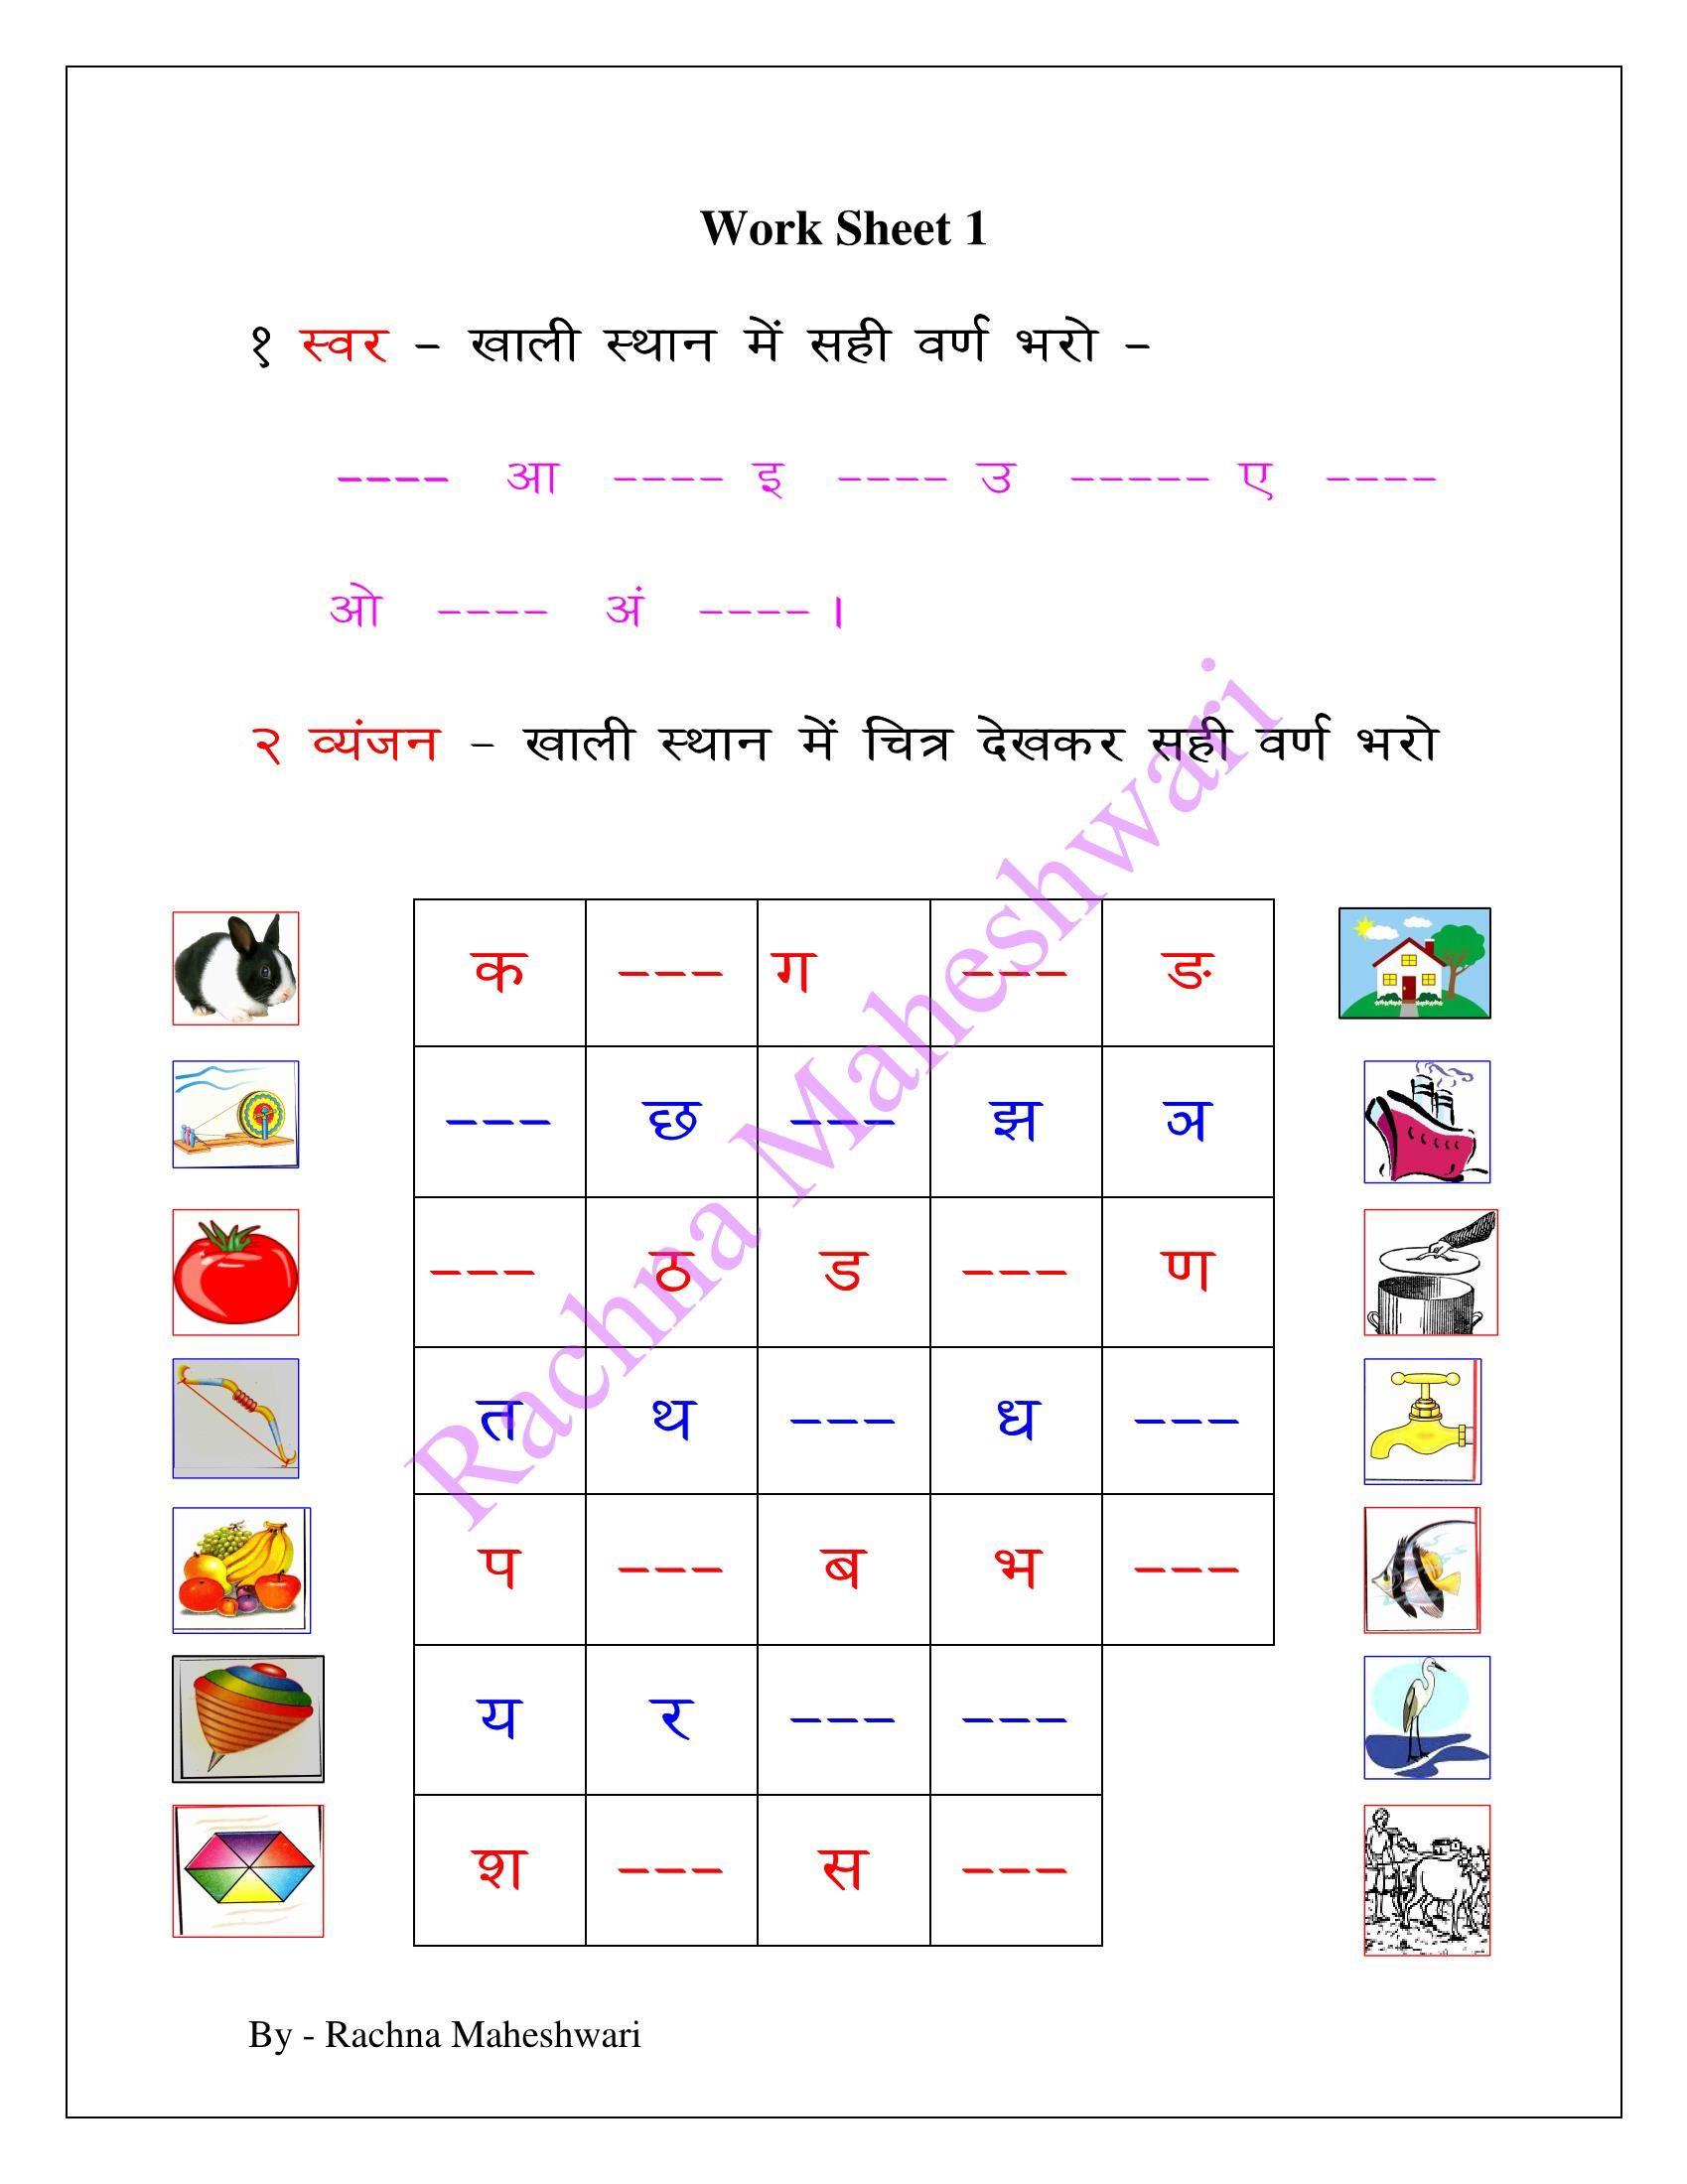 स्वर व्यंजन (6 Work Sheets- Easy to follow)   Hindi worksheets [ 2200 x 1699 Pixel ]